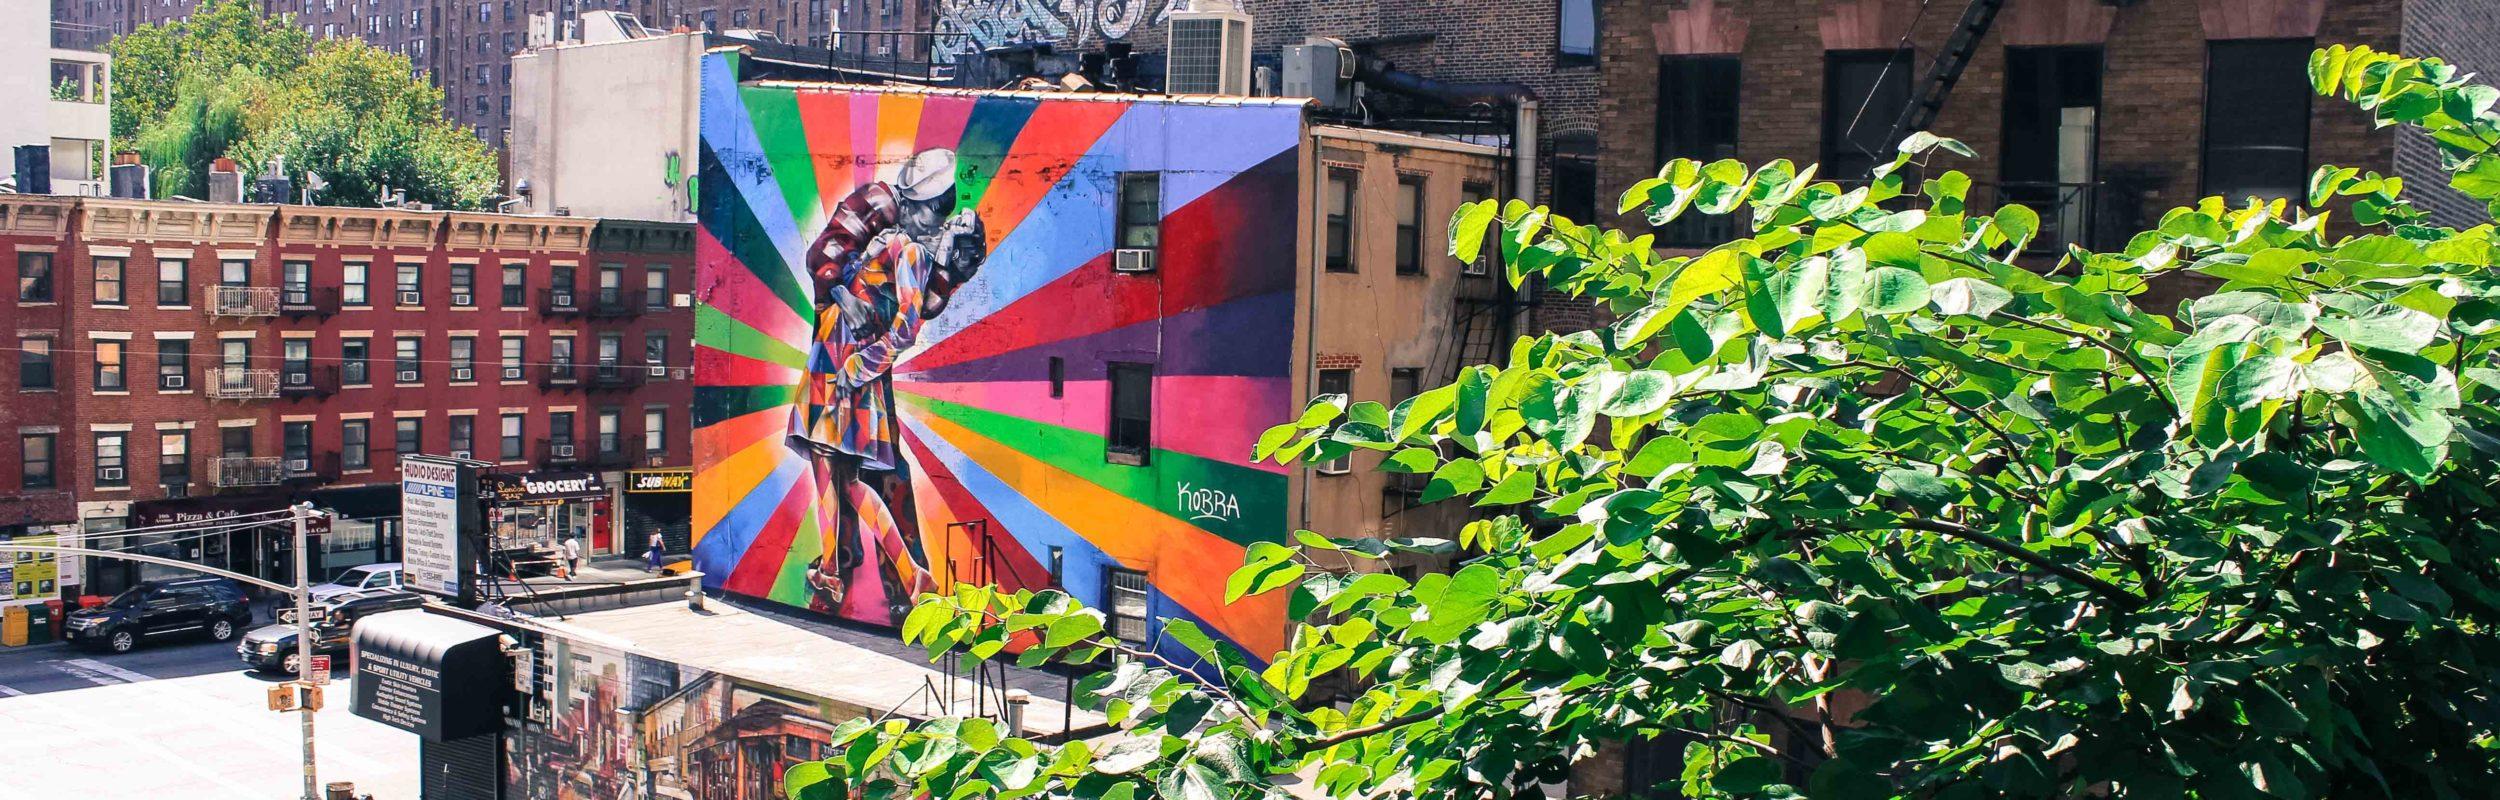 New York City #3 : La fabuleuse High Line